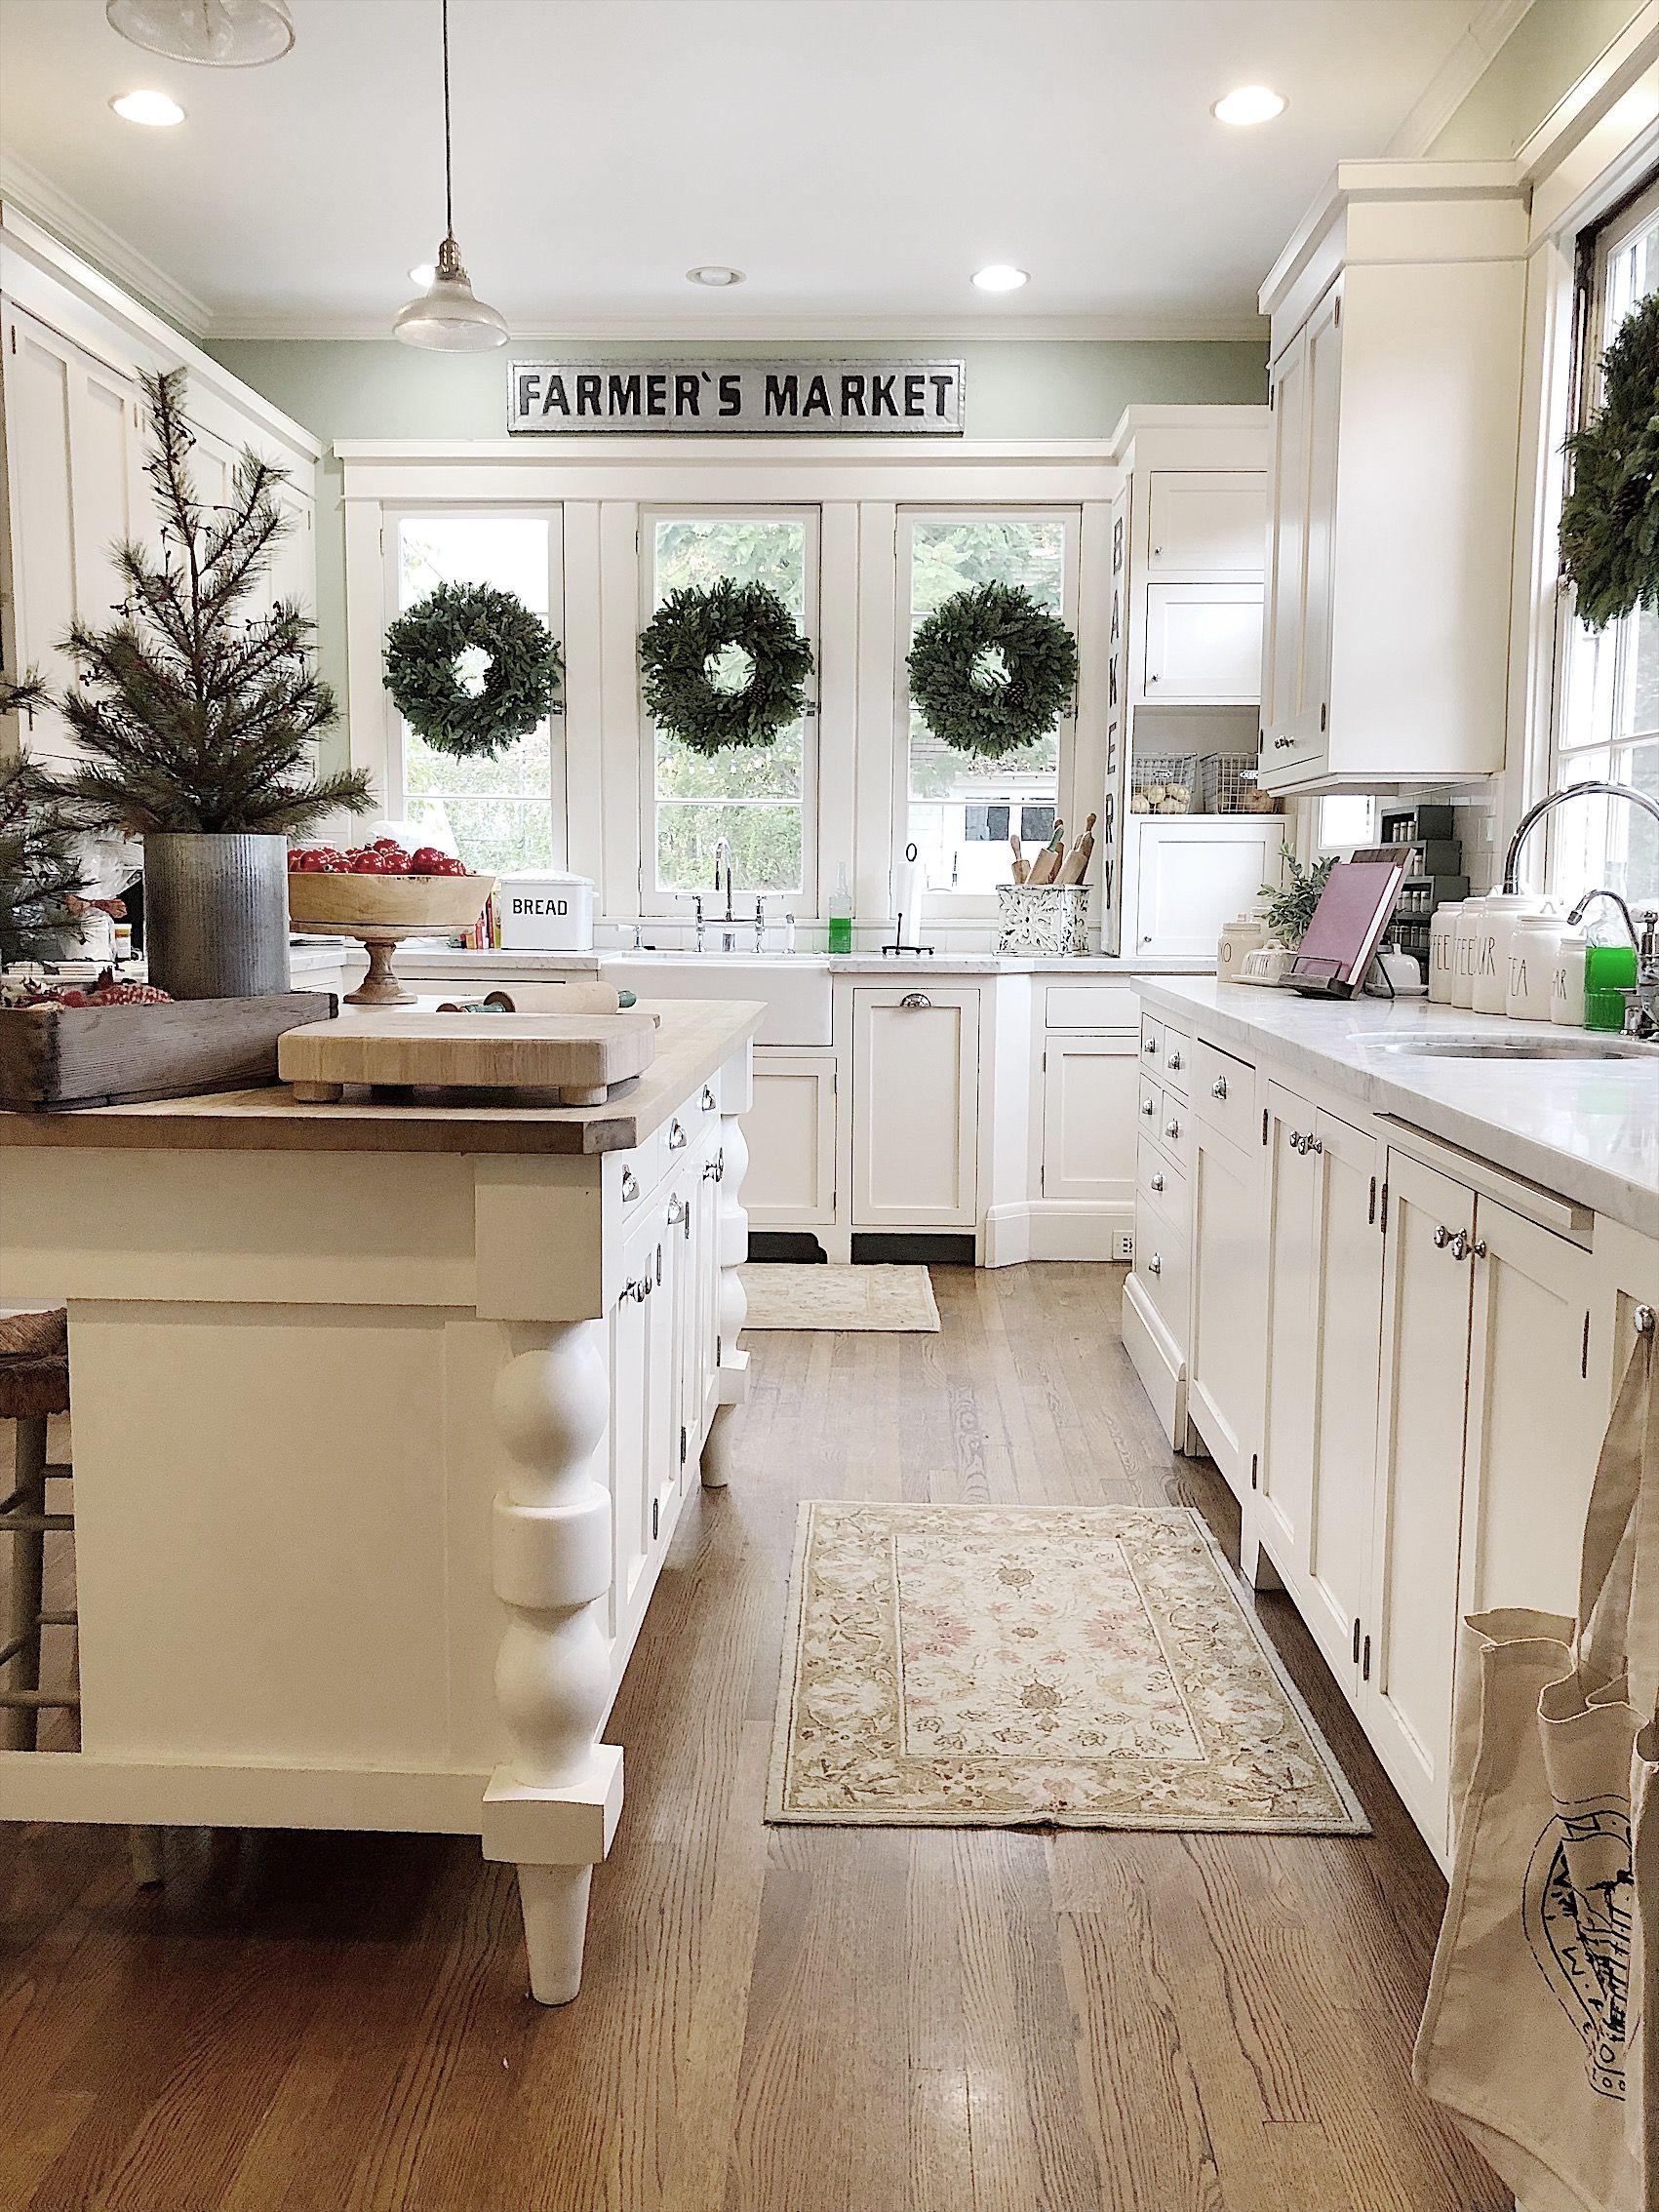 holiday home tour and housewalk christmas house at stonegable rh pinterest com